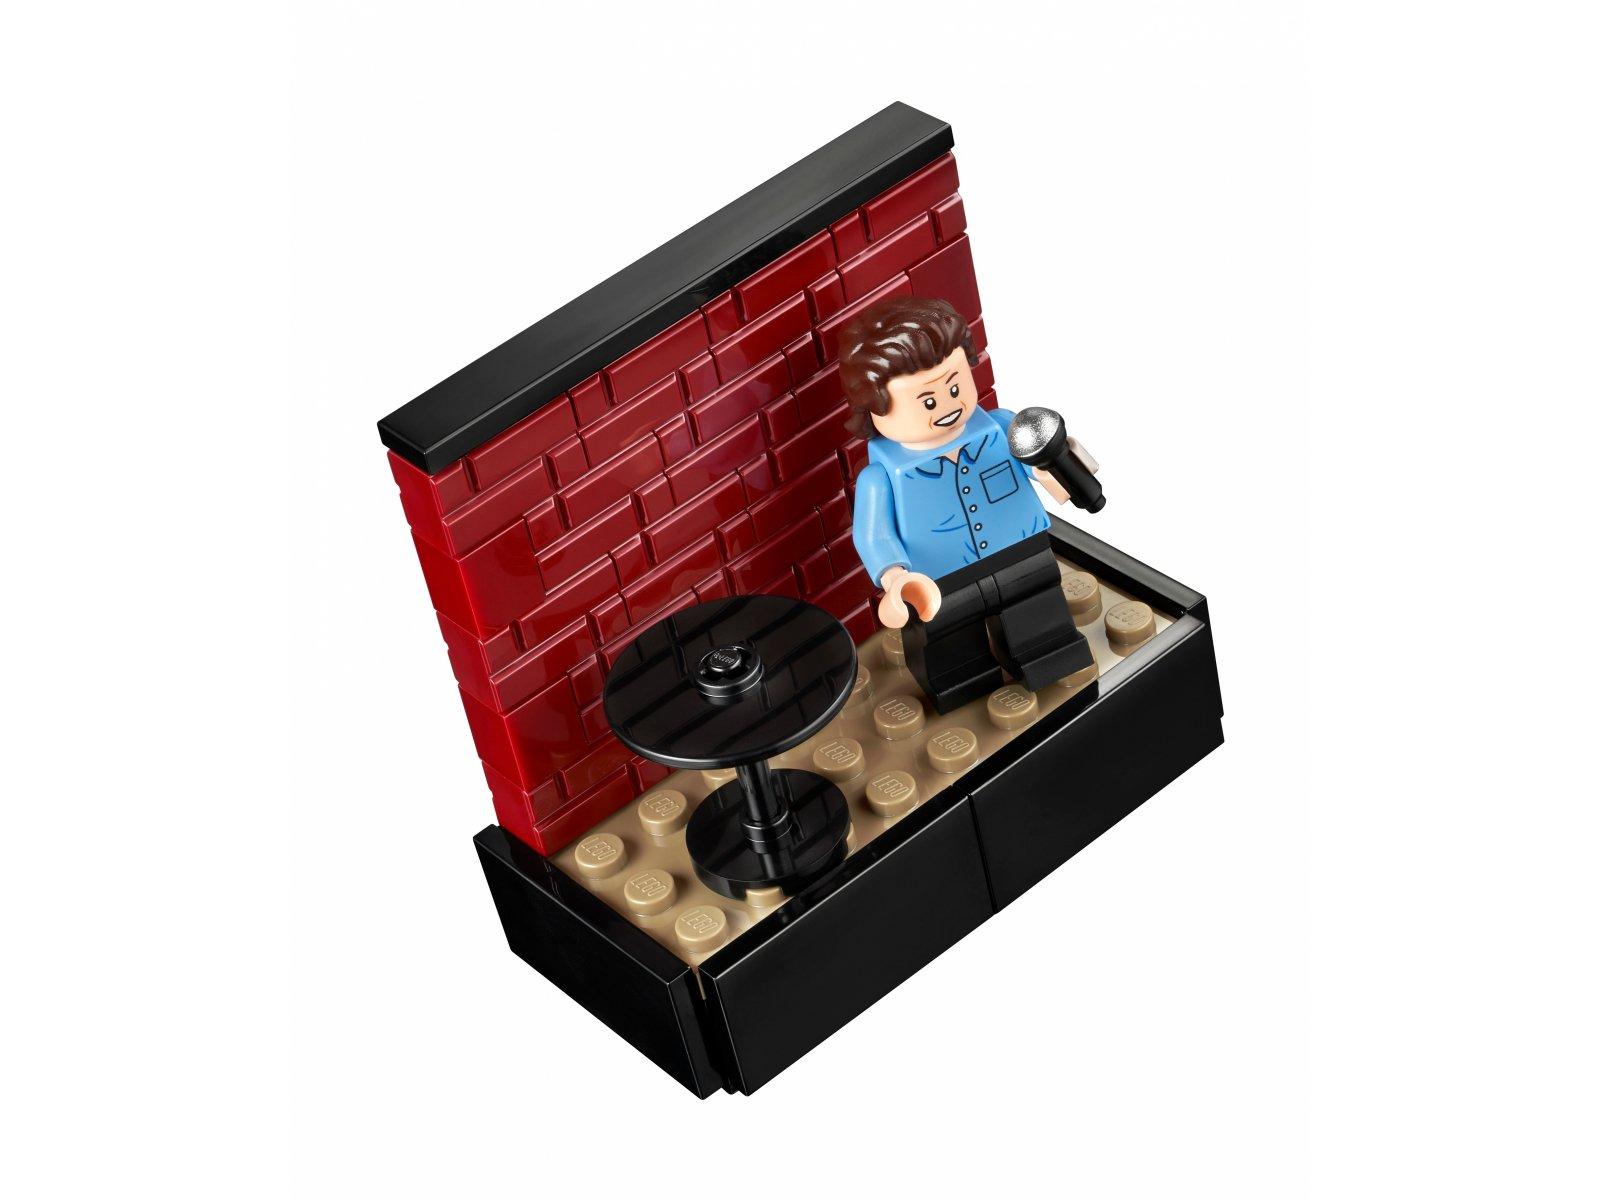 LEGO 21328 Ideas Seinfeld